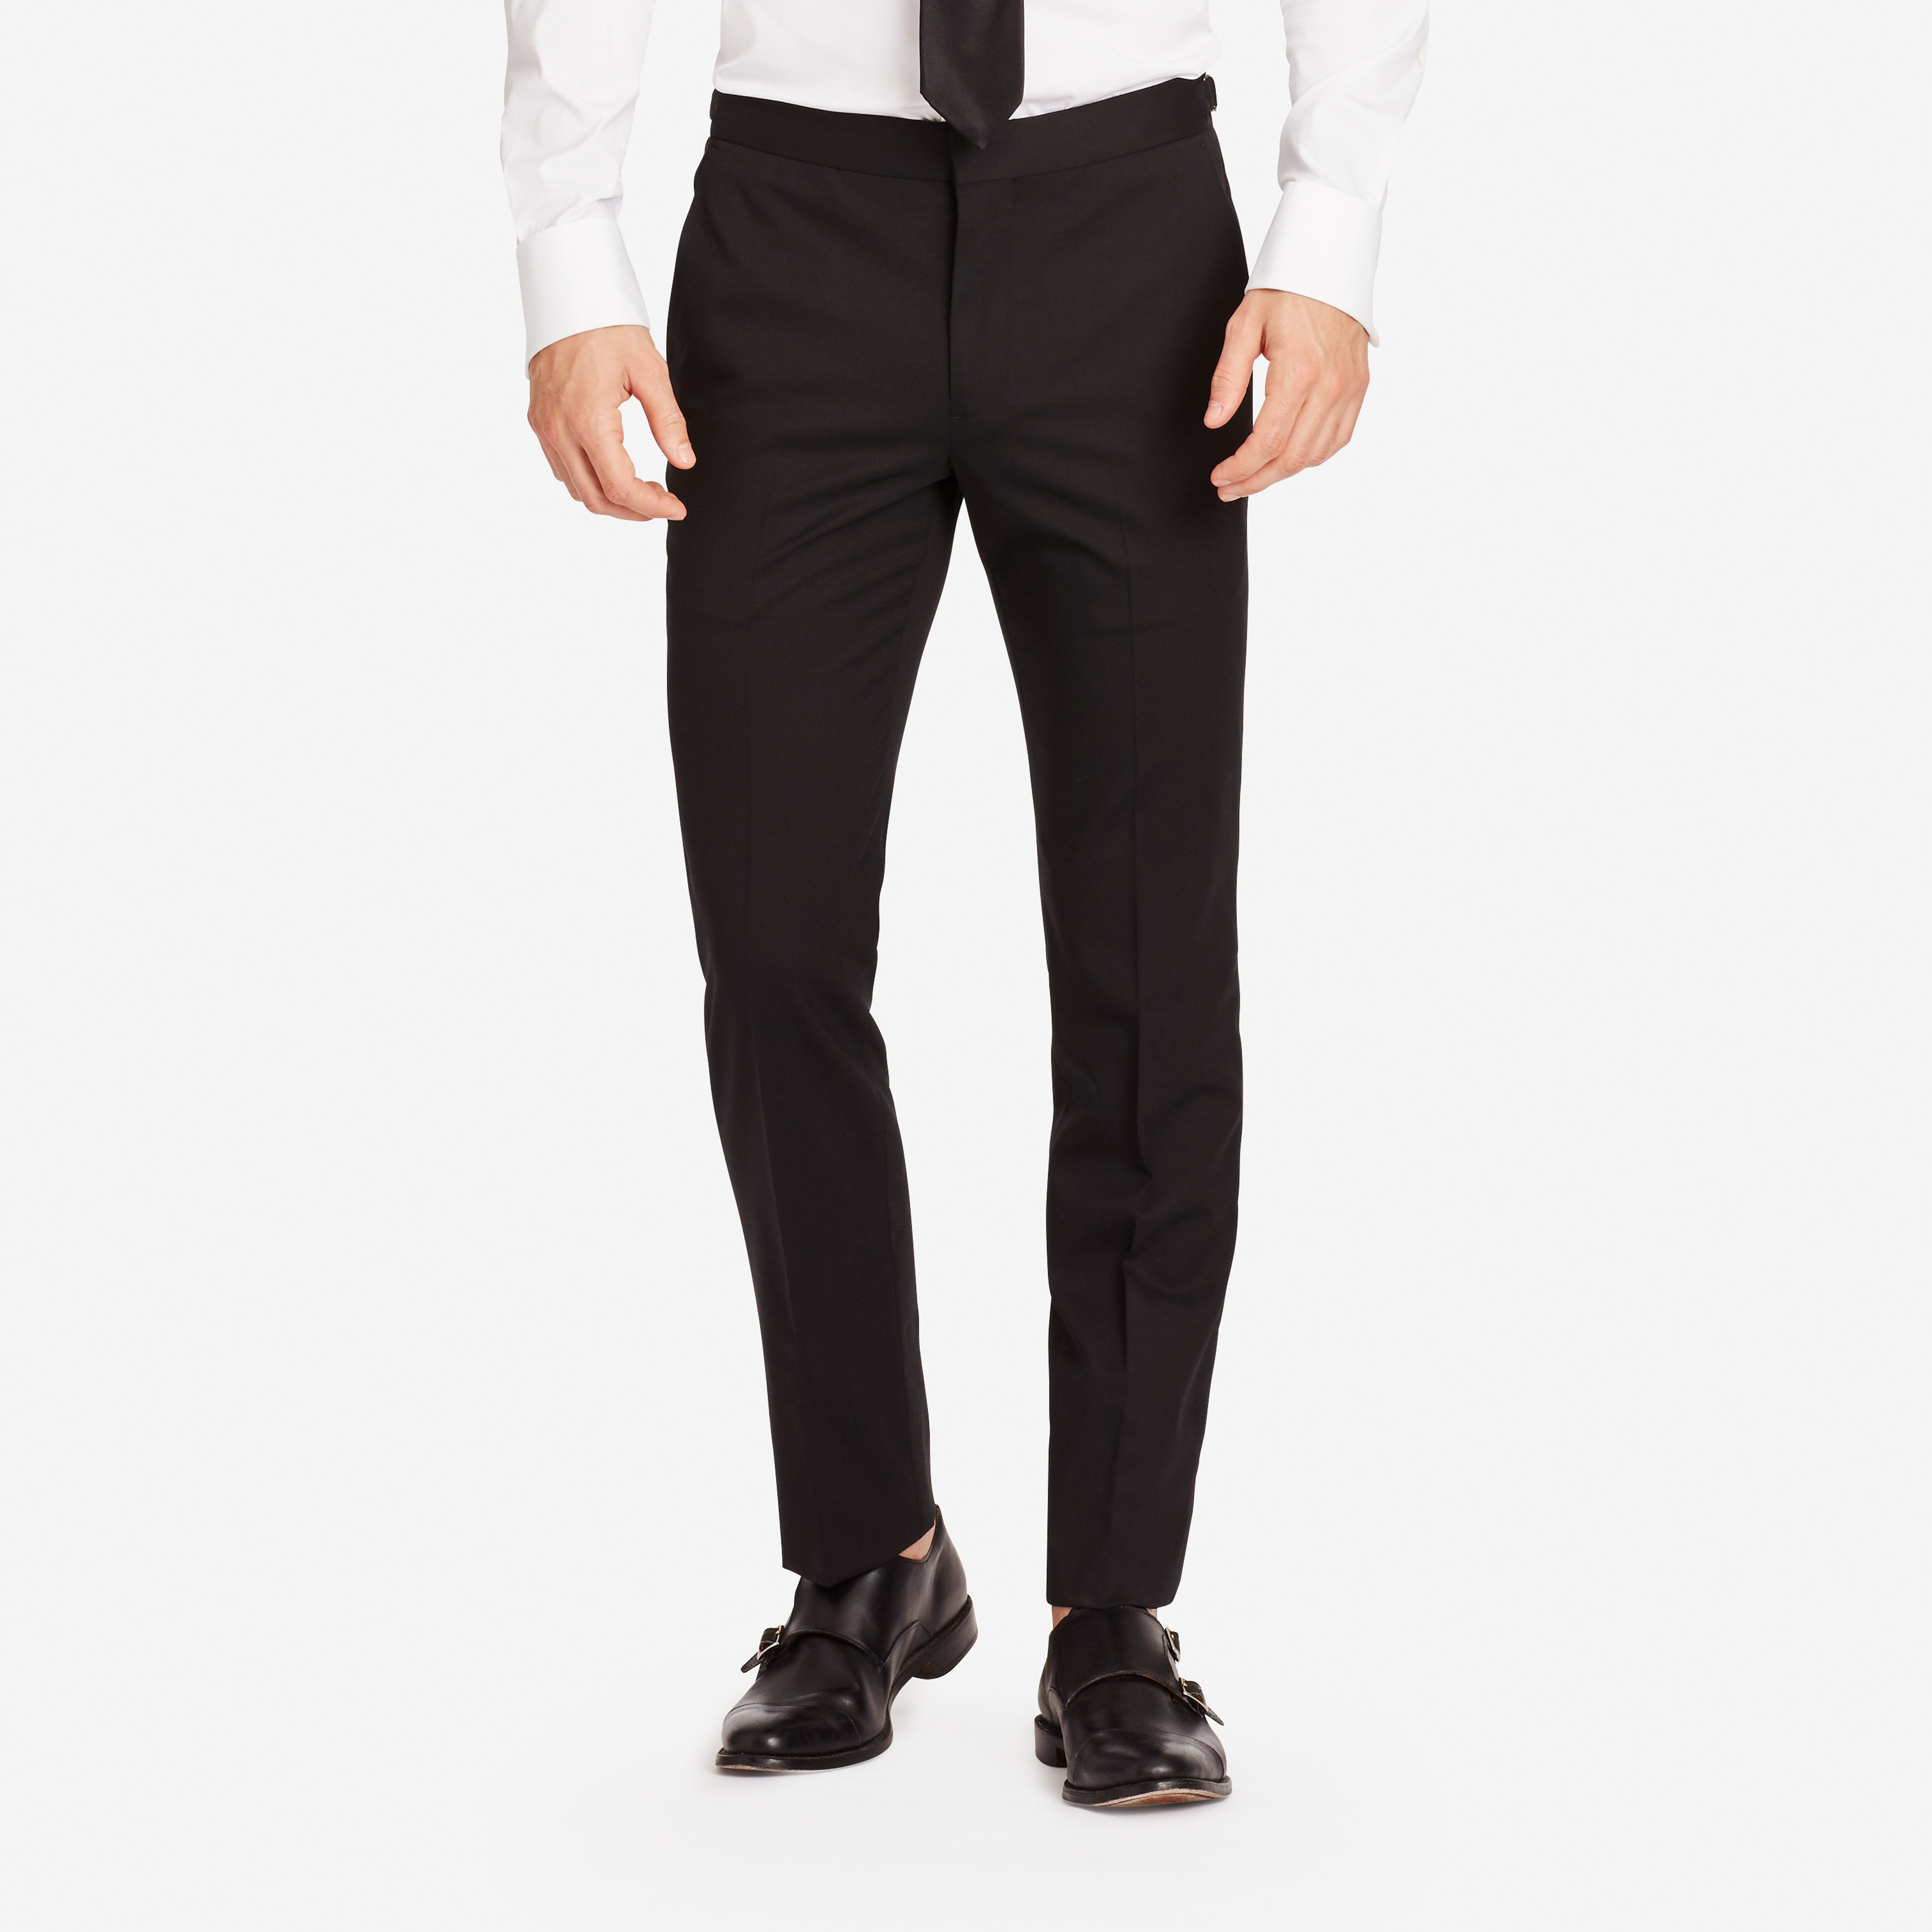 Jetsetter Stretch Italian Wool Tuxedo Pant